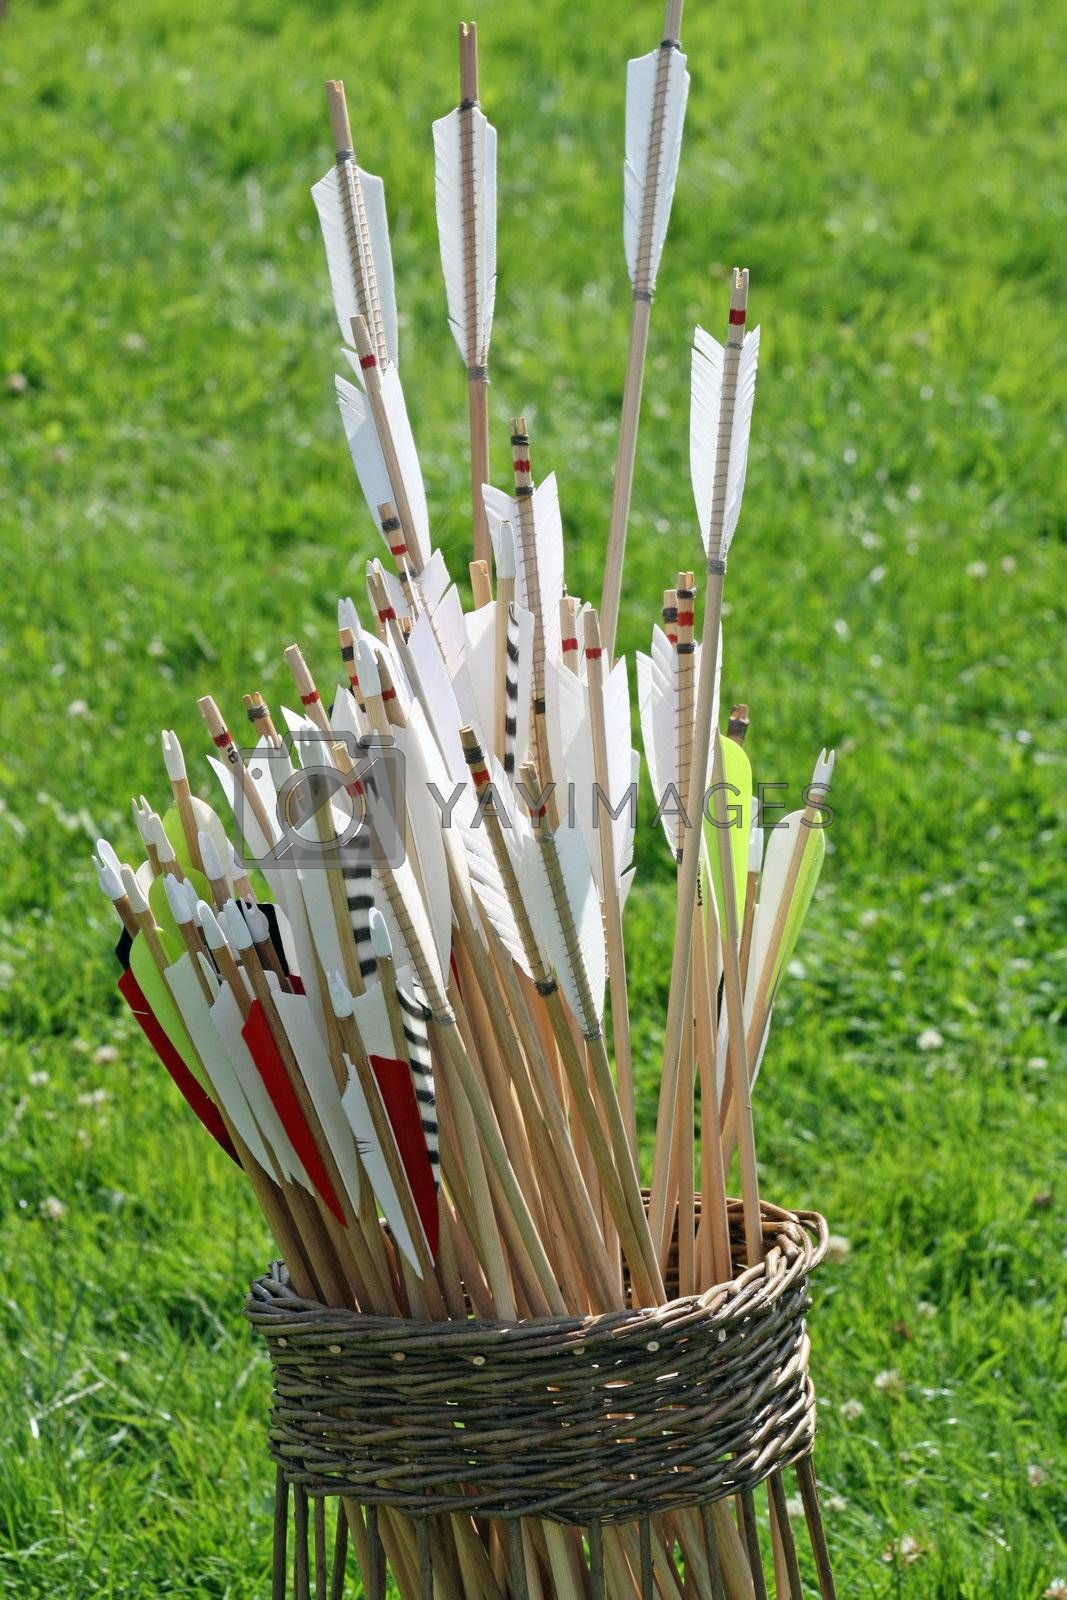 a basket of arrows